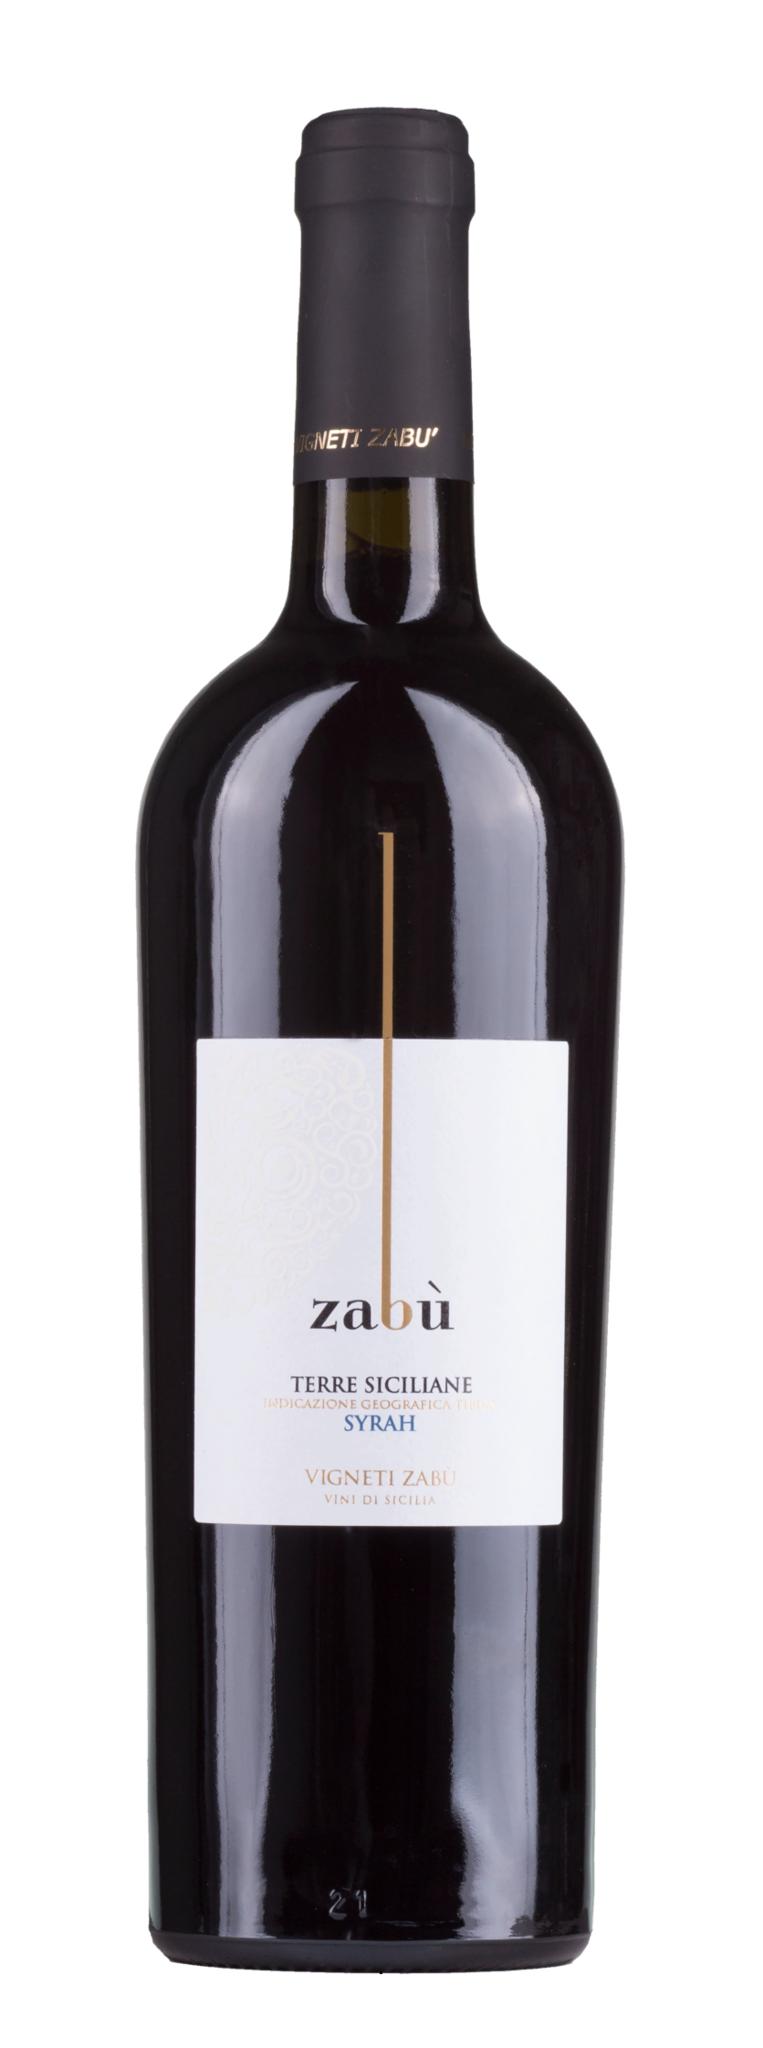 Farnese, Mittel- & Süditalien 2019 Syrah Sicilia IGT Vigneti Zabu